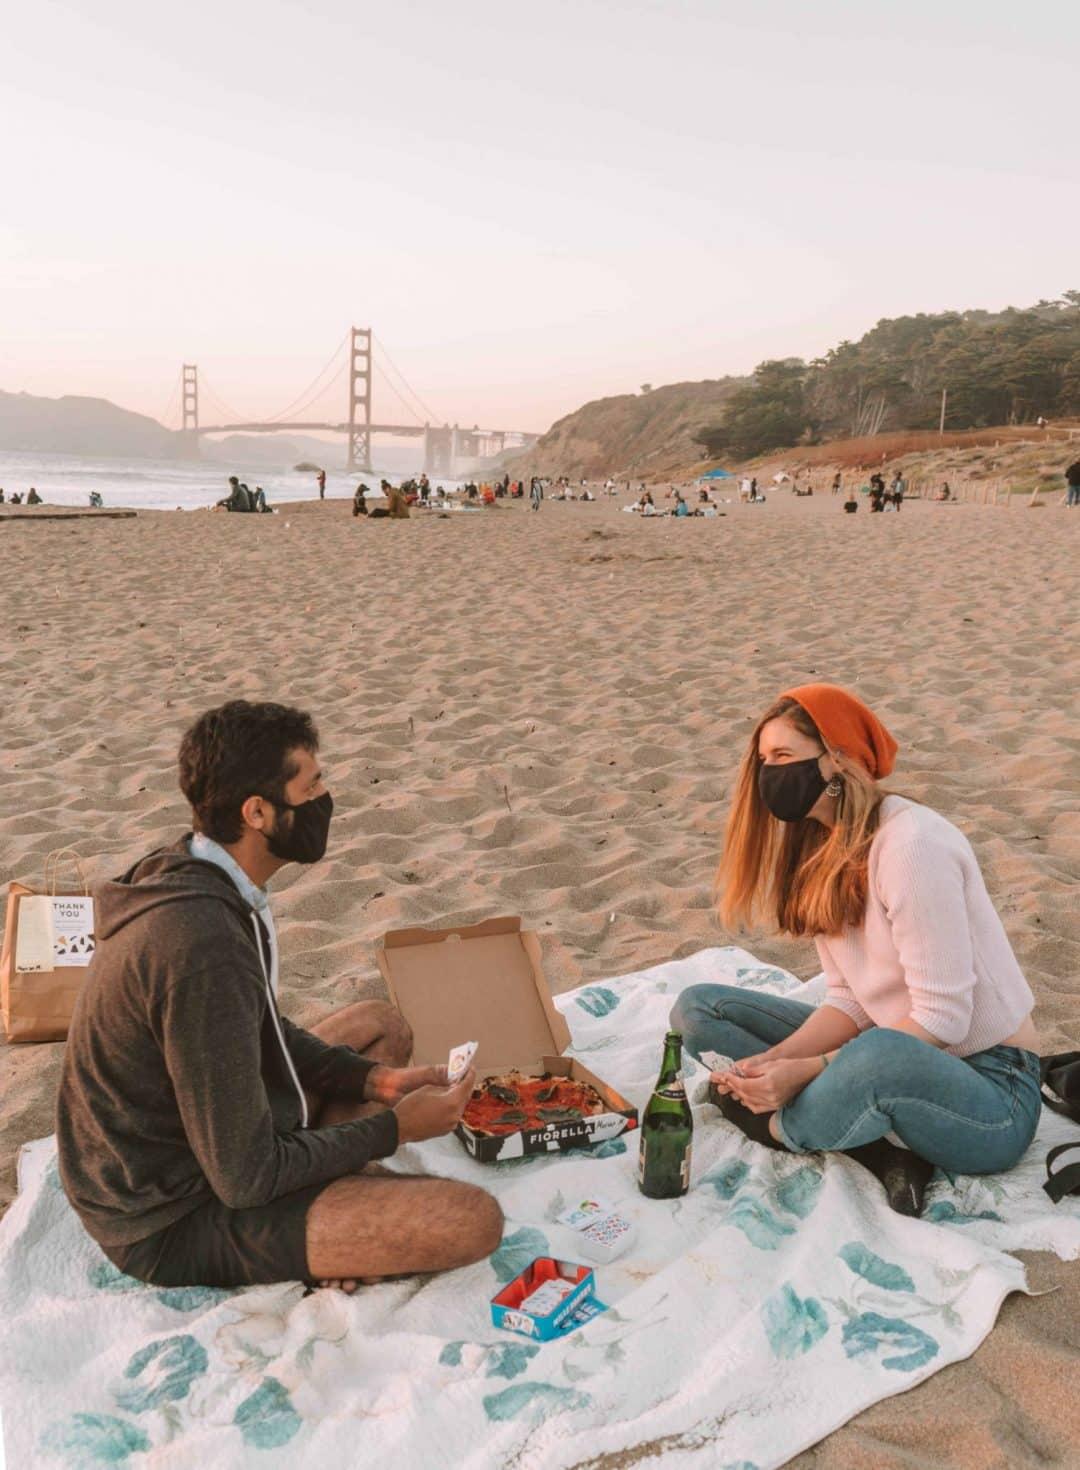 Baker Beach picnic